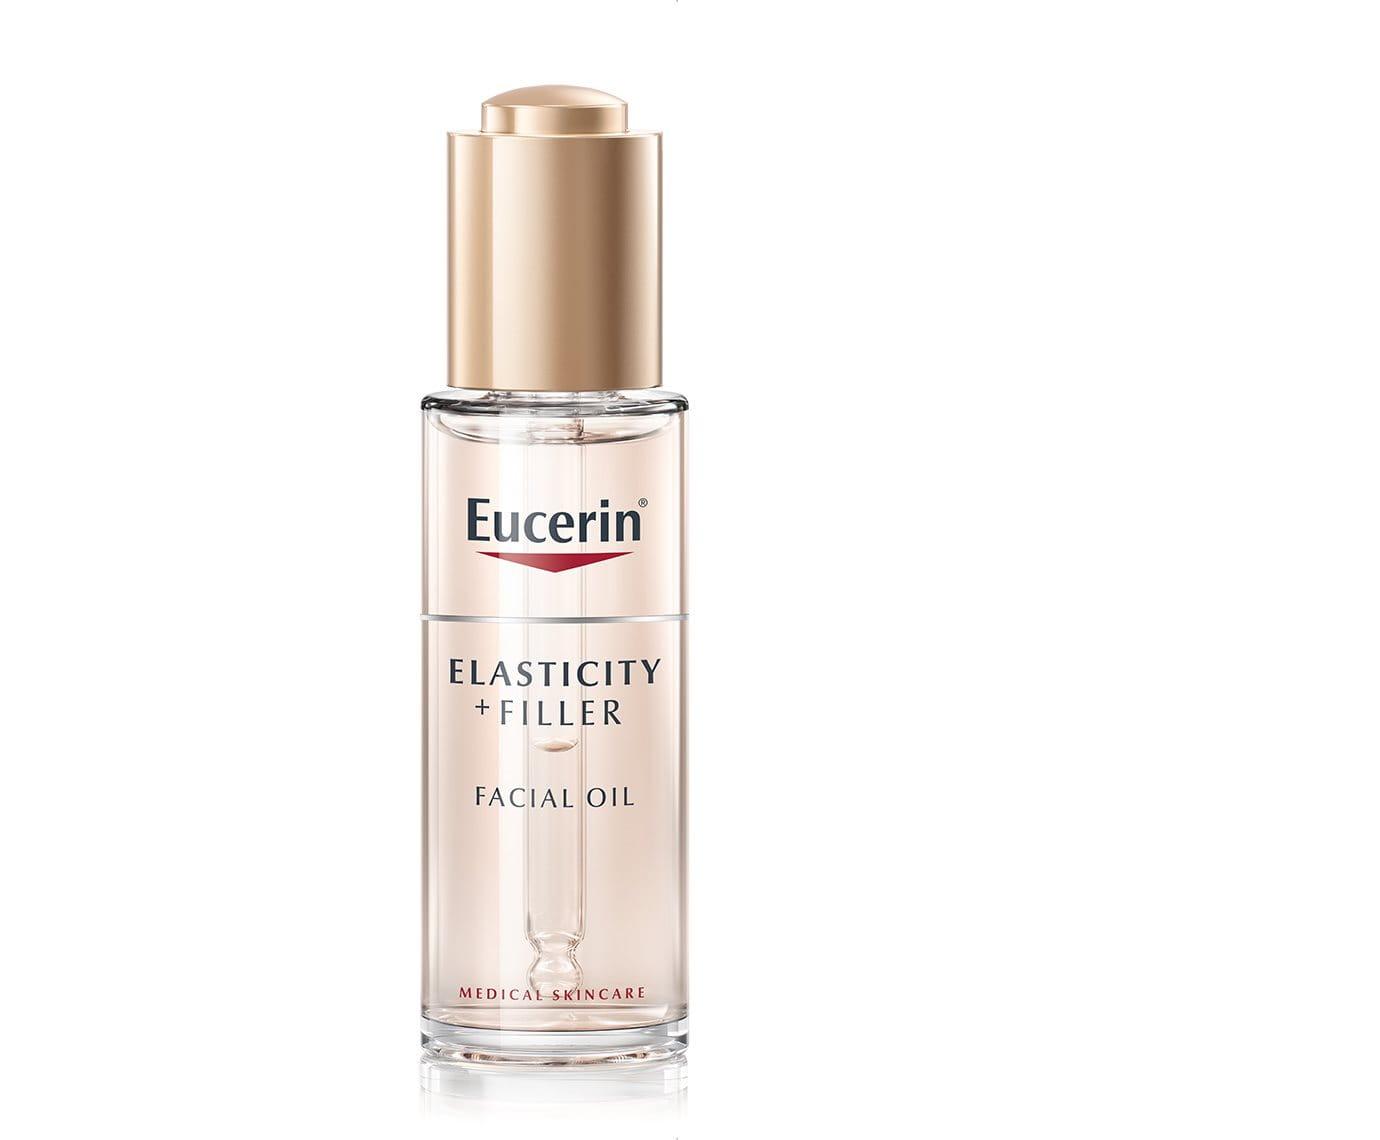 elasticity filler facial oil anti aging oil for mature skin eucerin. Black Bedroom Furniture Sets. Home Design Ideas